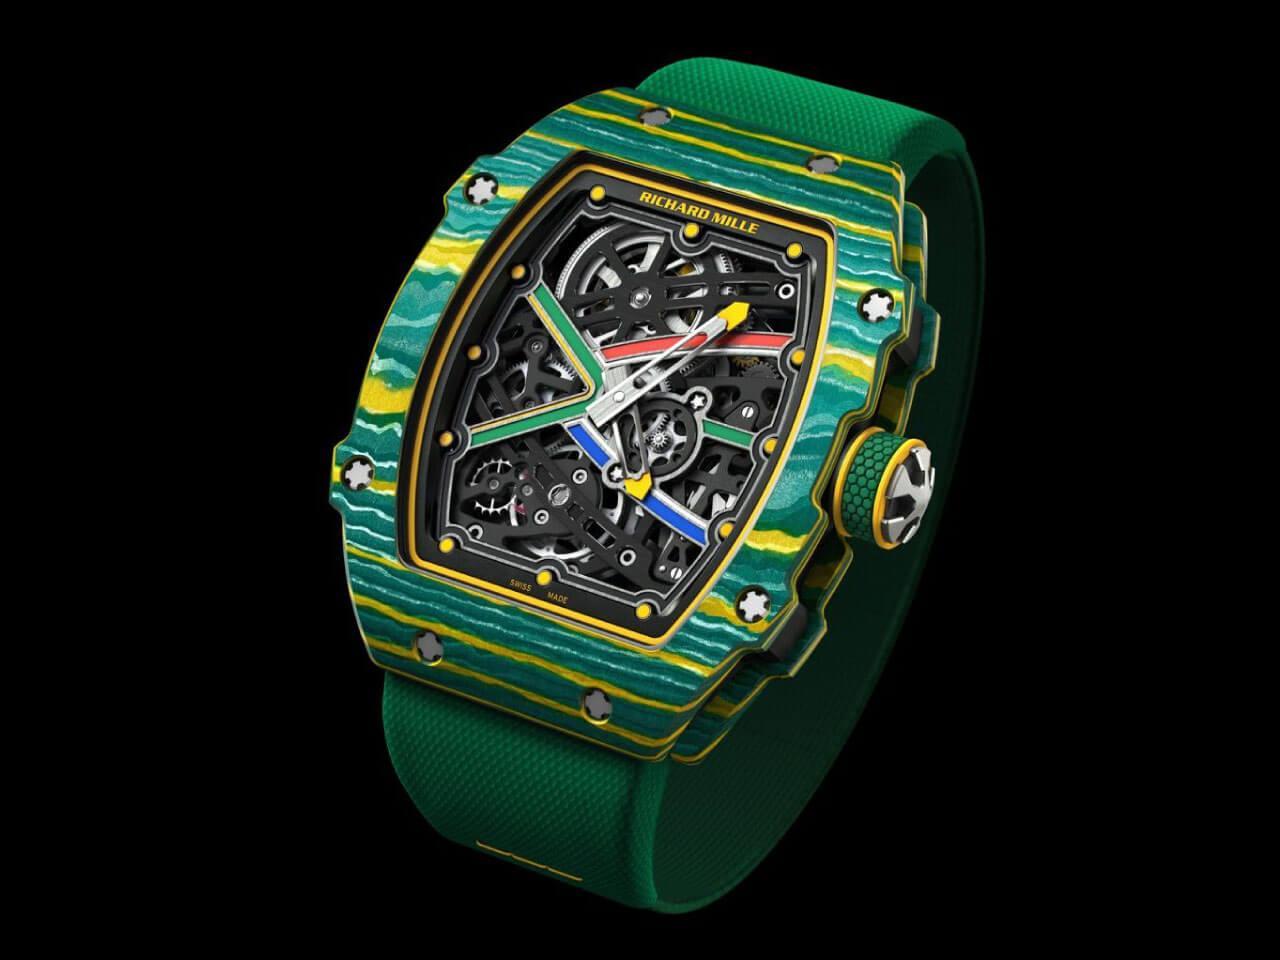 new style 790c7 af571 RICHARD MILLE(リシャール・ミル)新作 RM 67-02 ...